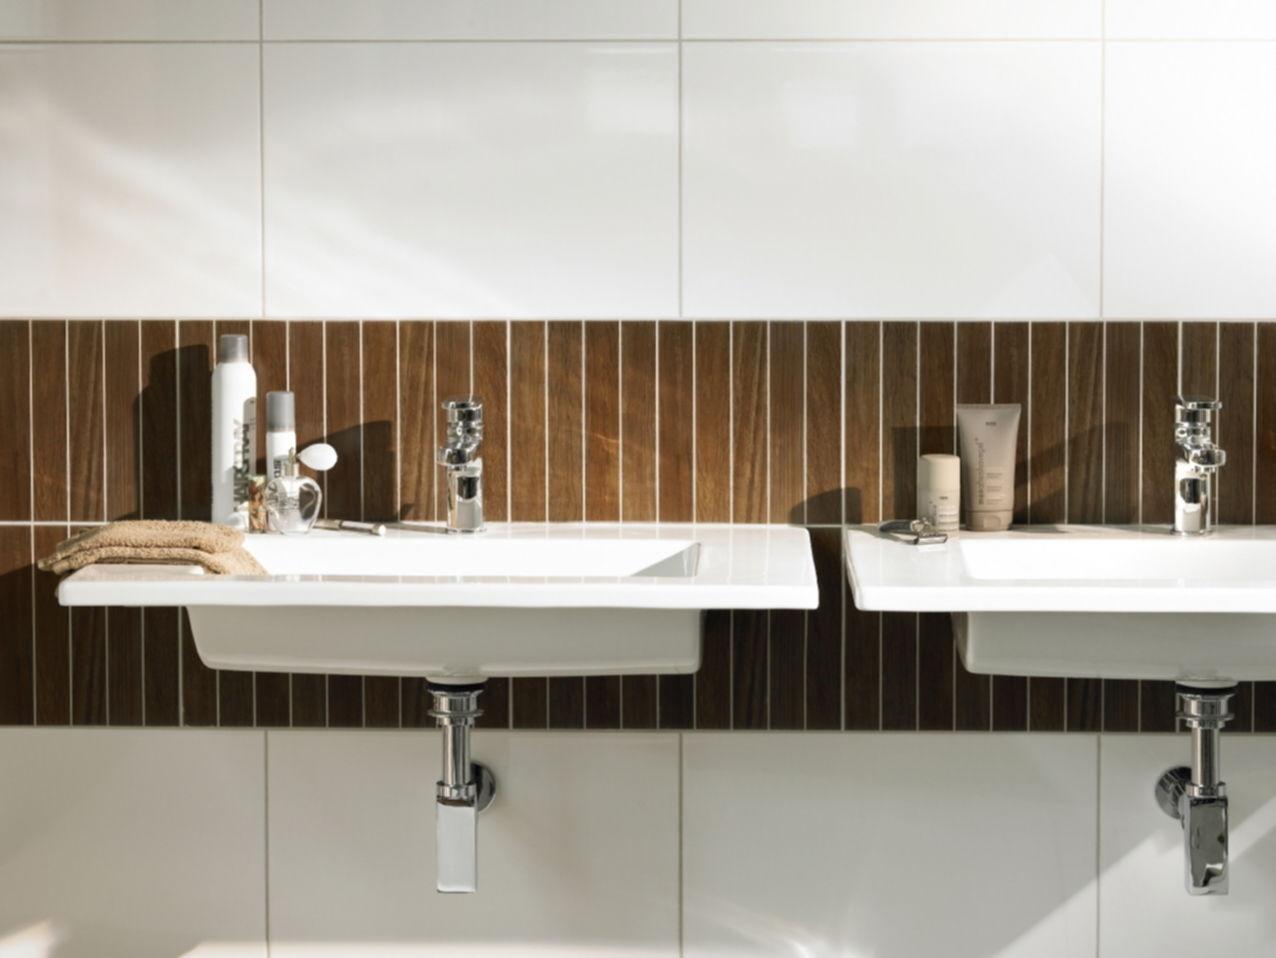 Badkamer verwarming elektrisch praxis stunning set met panelen